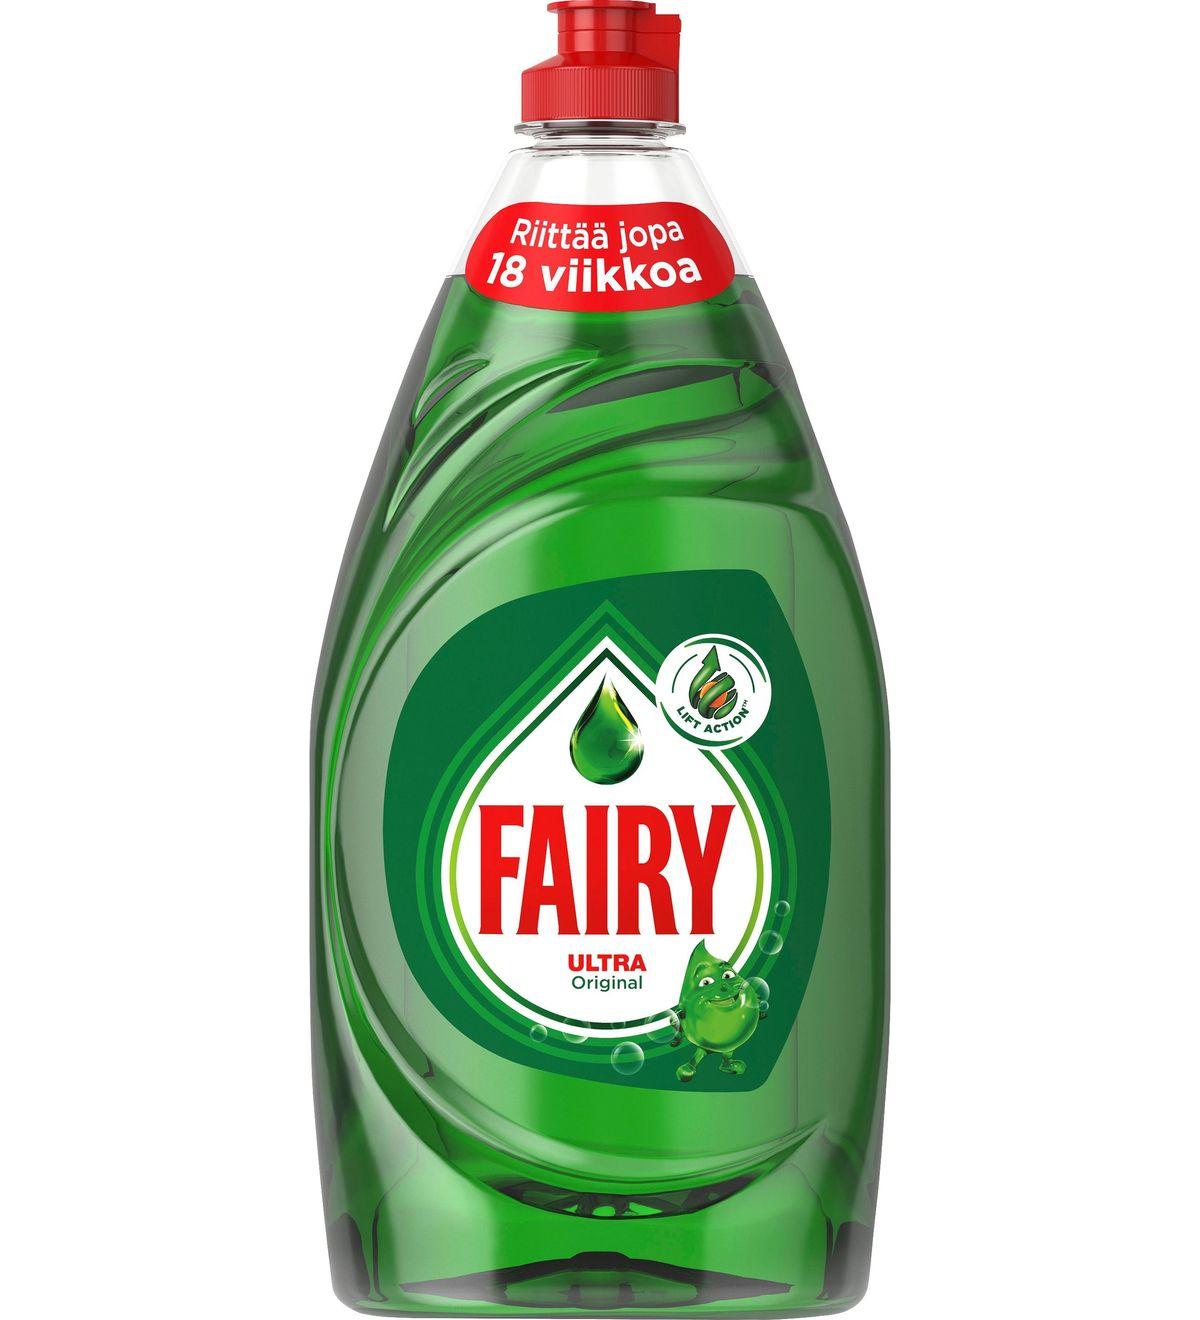 Fairy astianpesuaine 900 ml